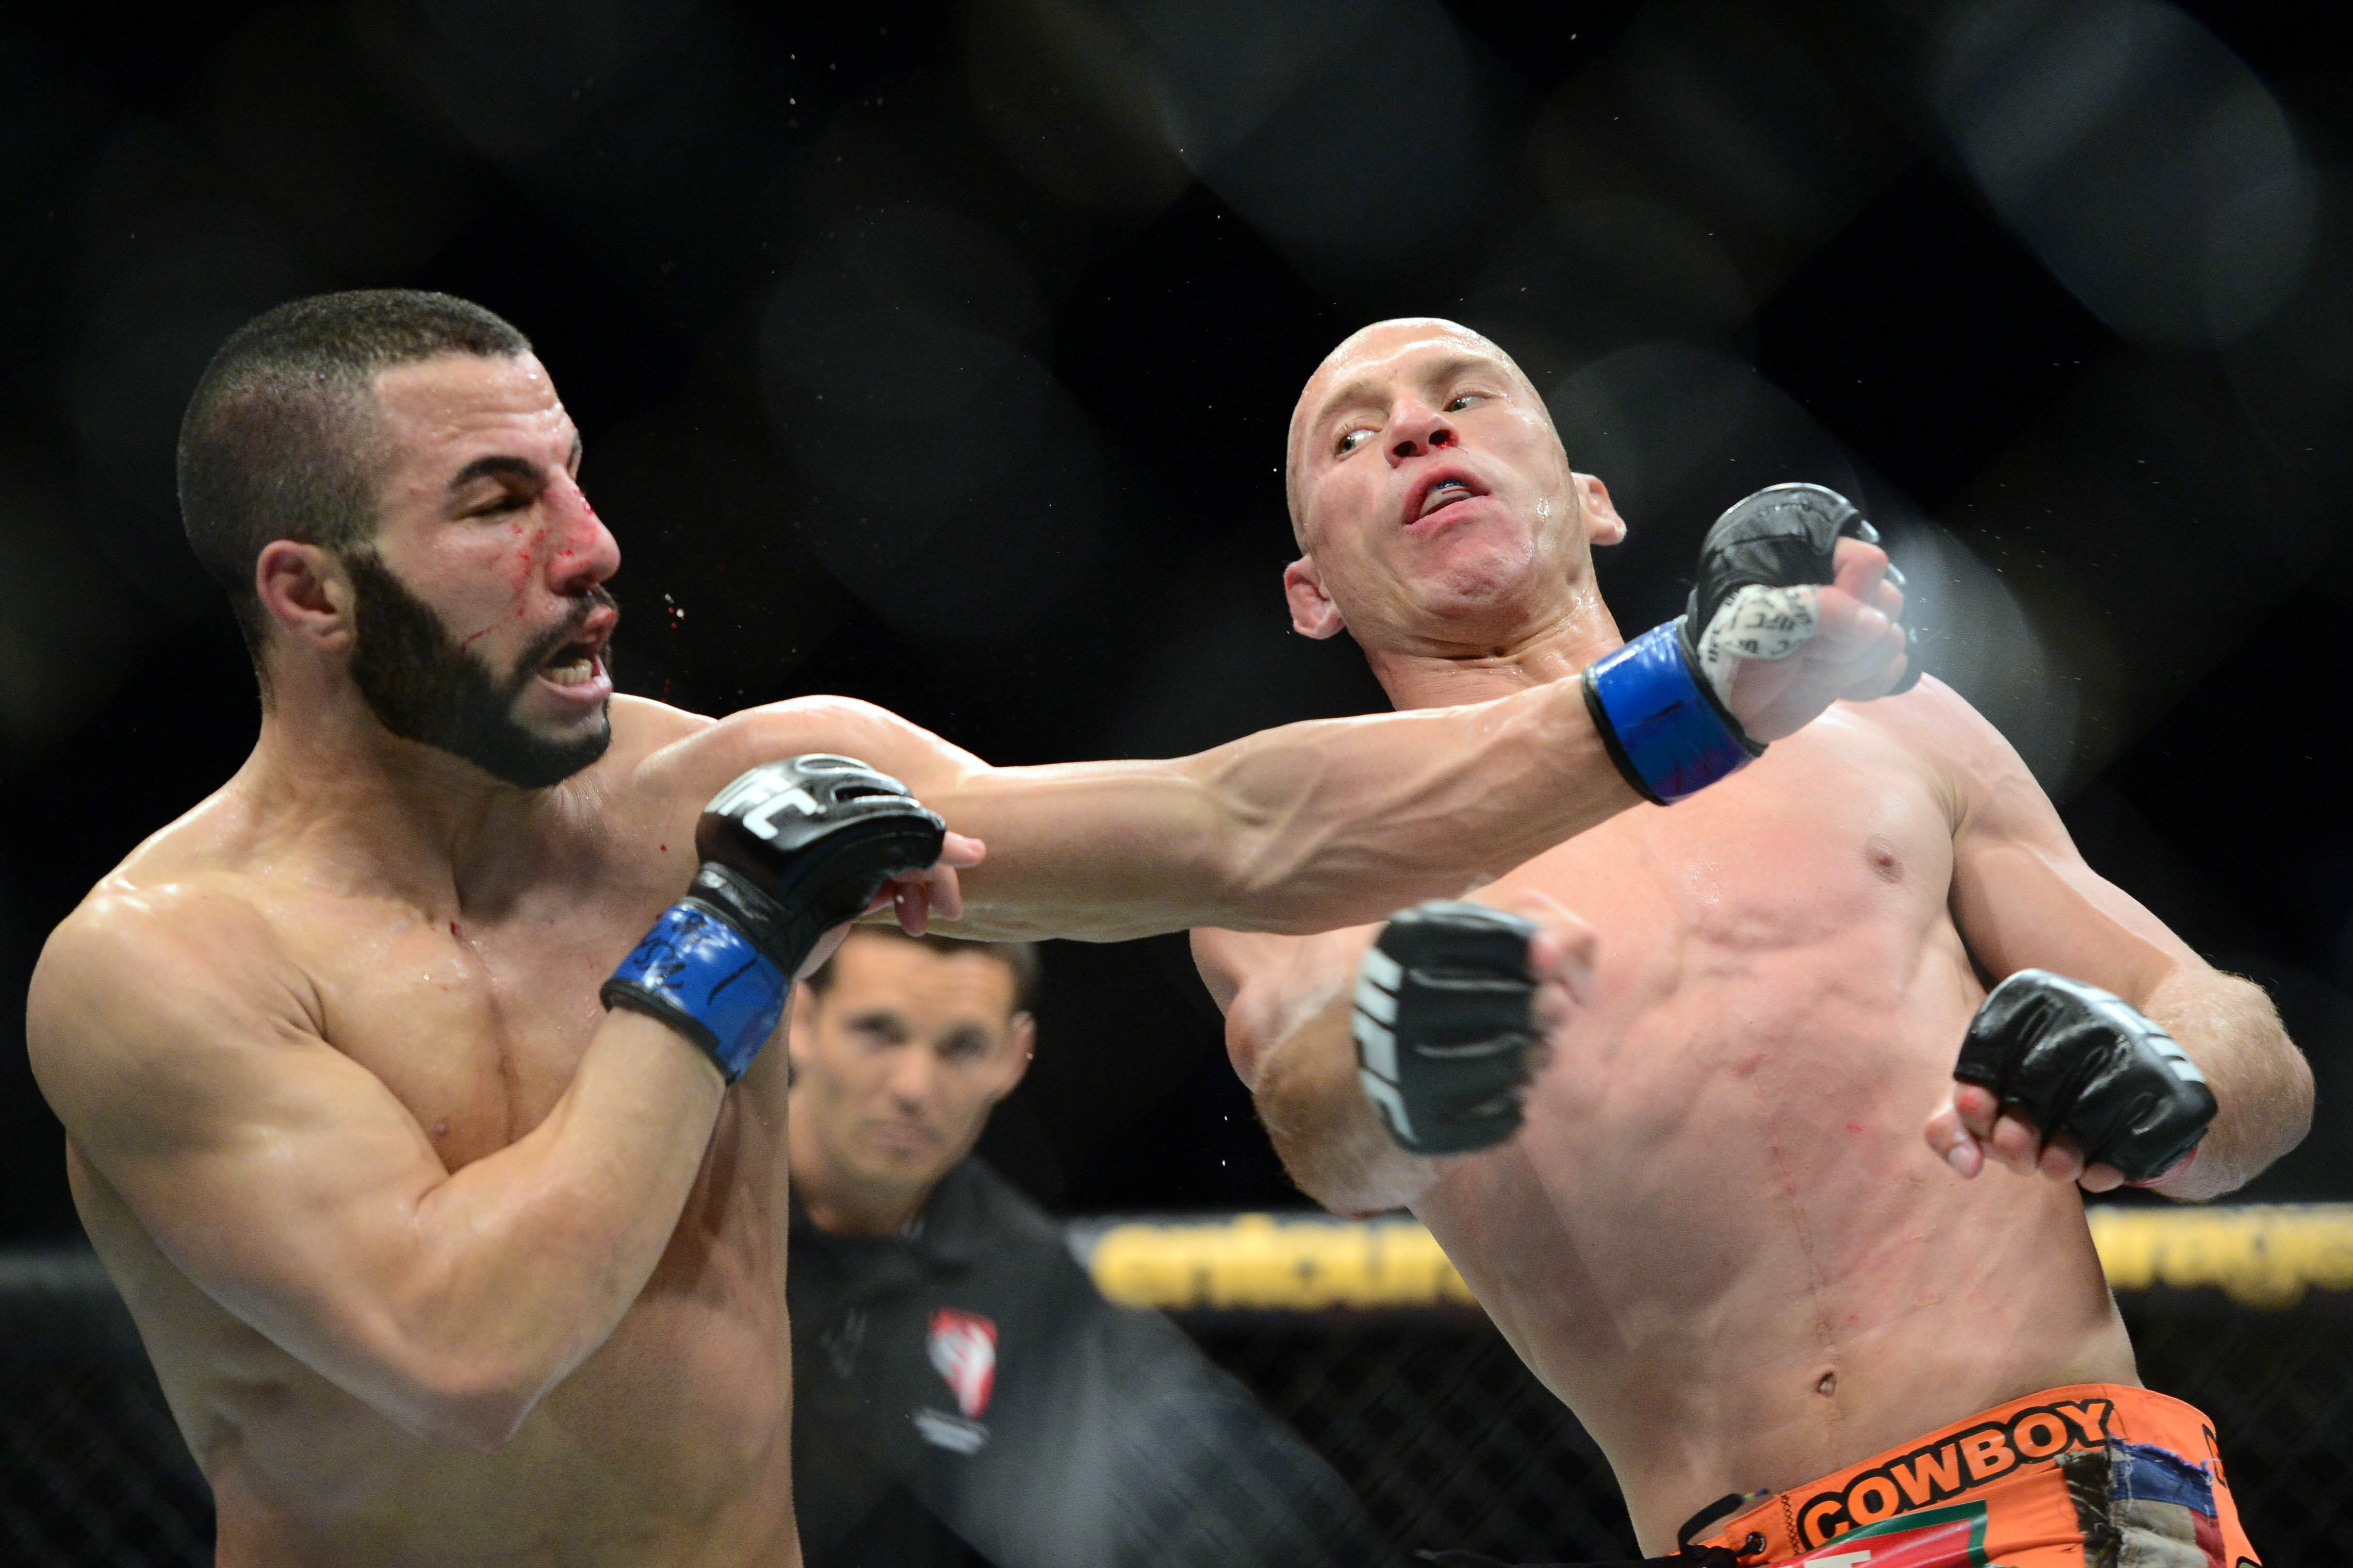 John Makdessi (L) takes a hard shot from Donald Cerrone at UFC 187.